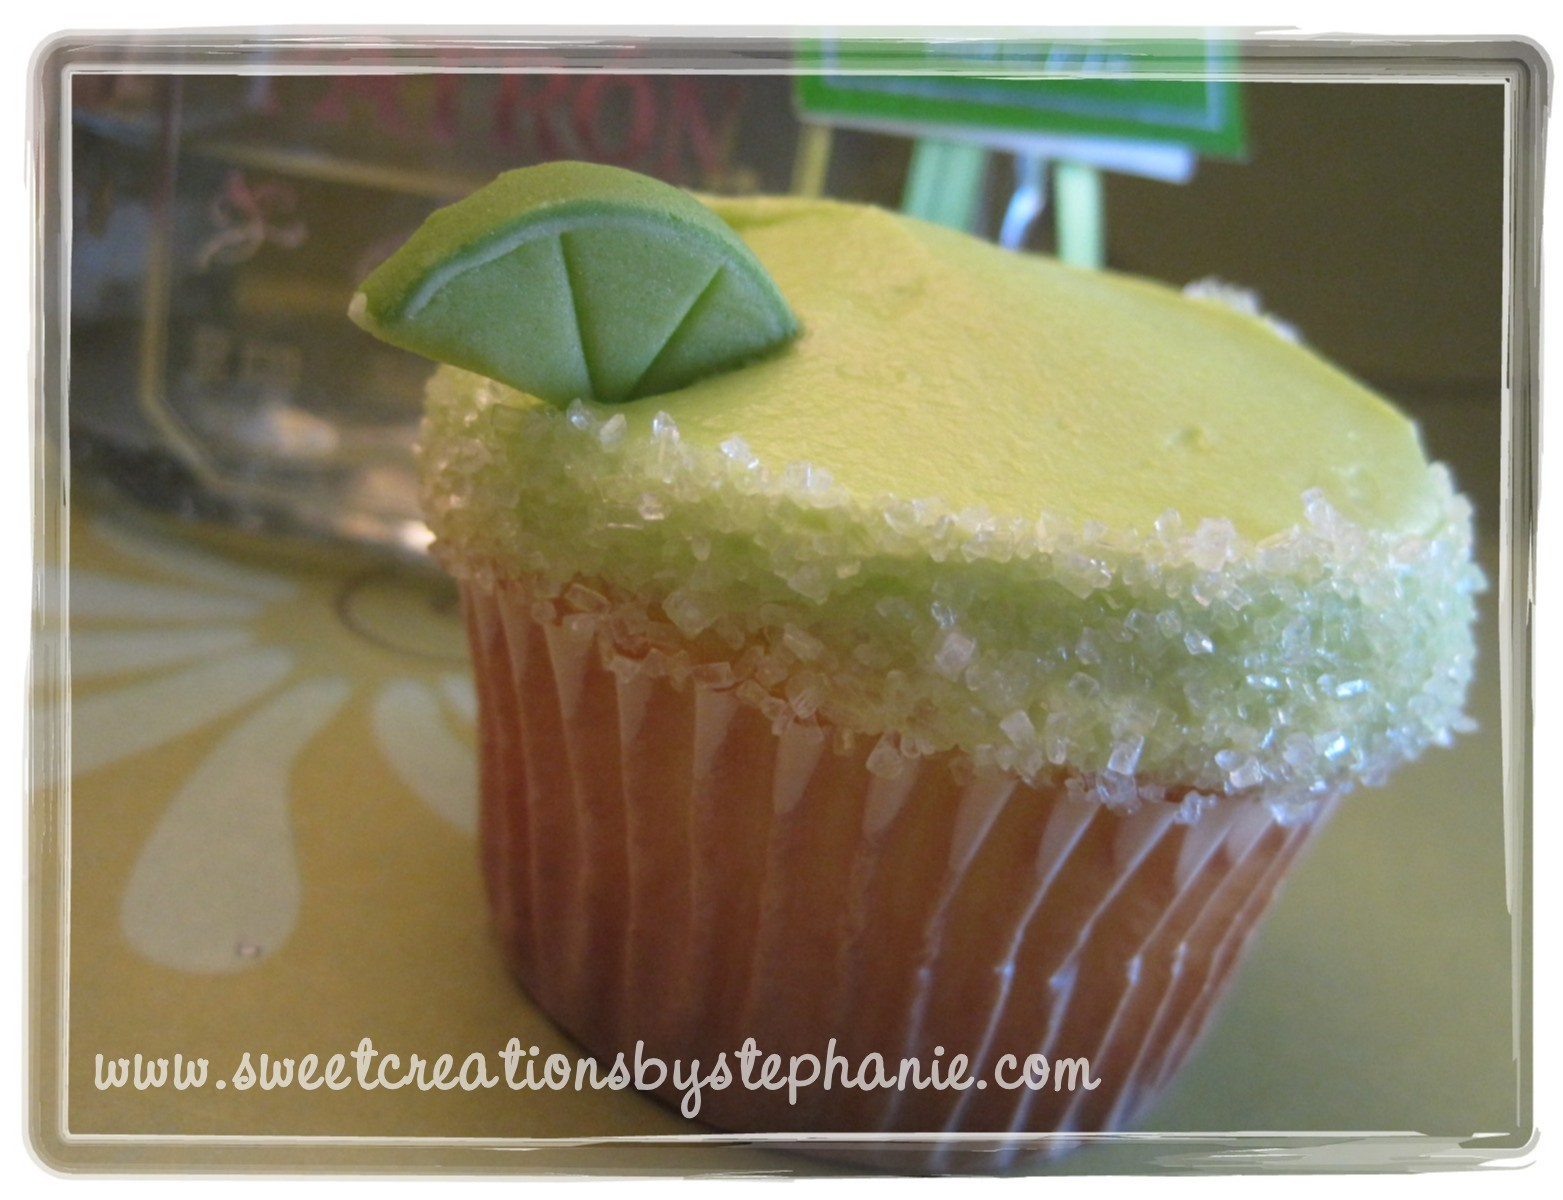 Patron Margarita Cupcakes